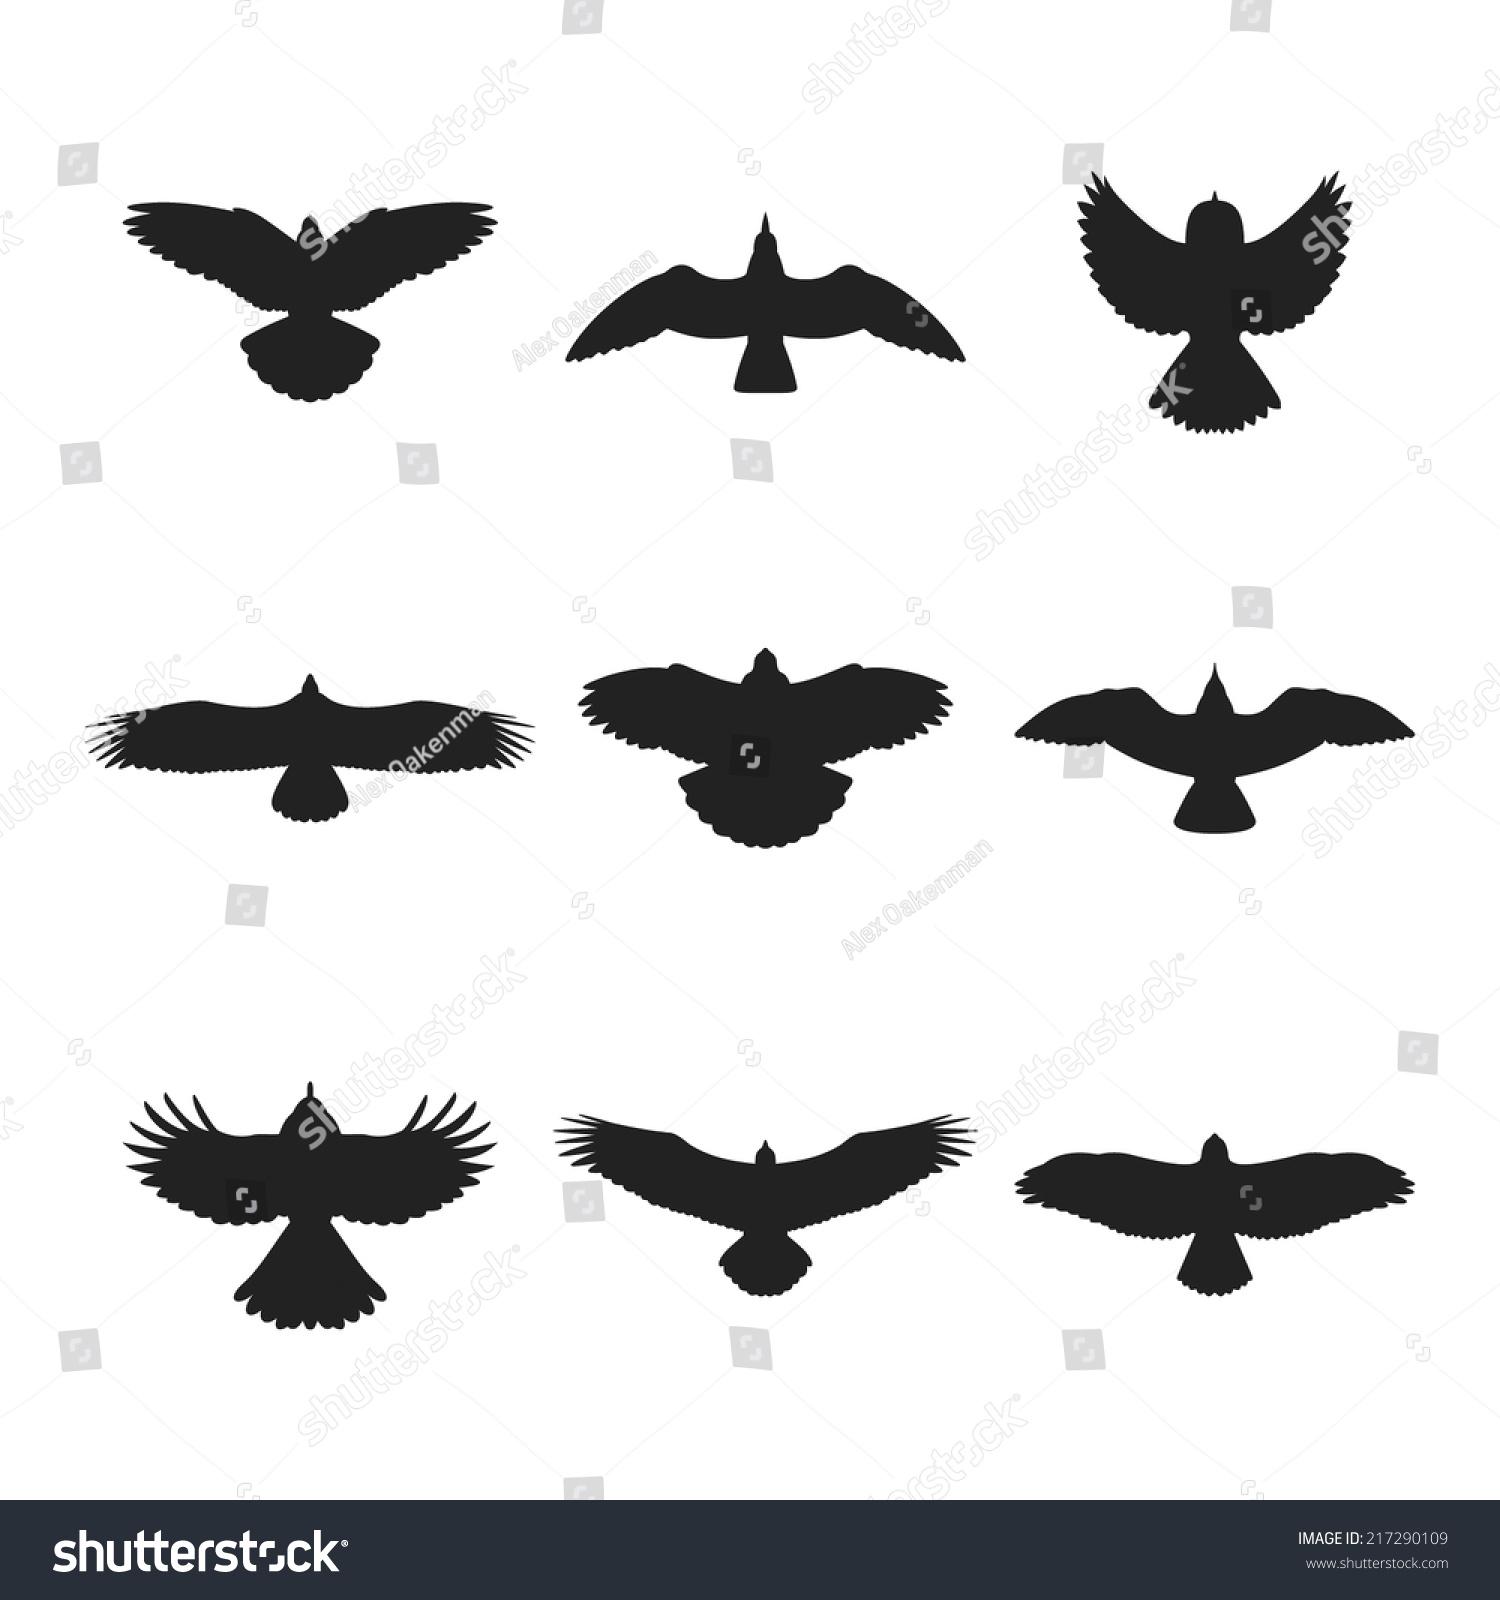 Flying Bird Like Eagle Sparrow Dove Stock Vector 217290109 ... Flying Hawk Silhouette Vector